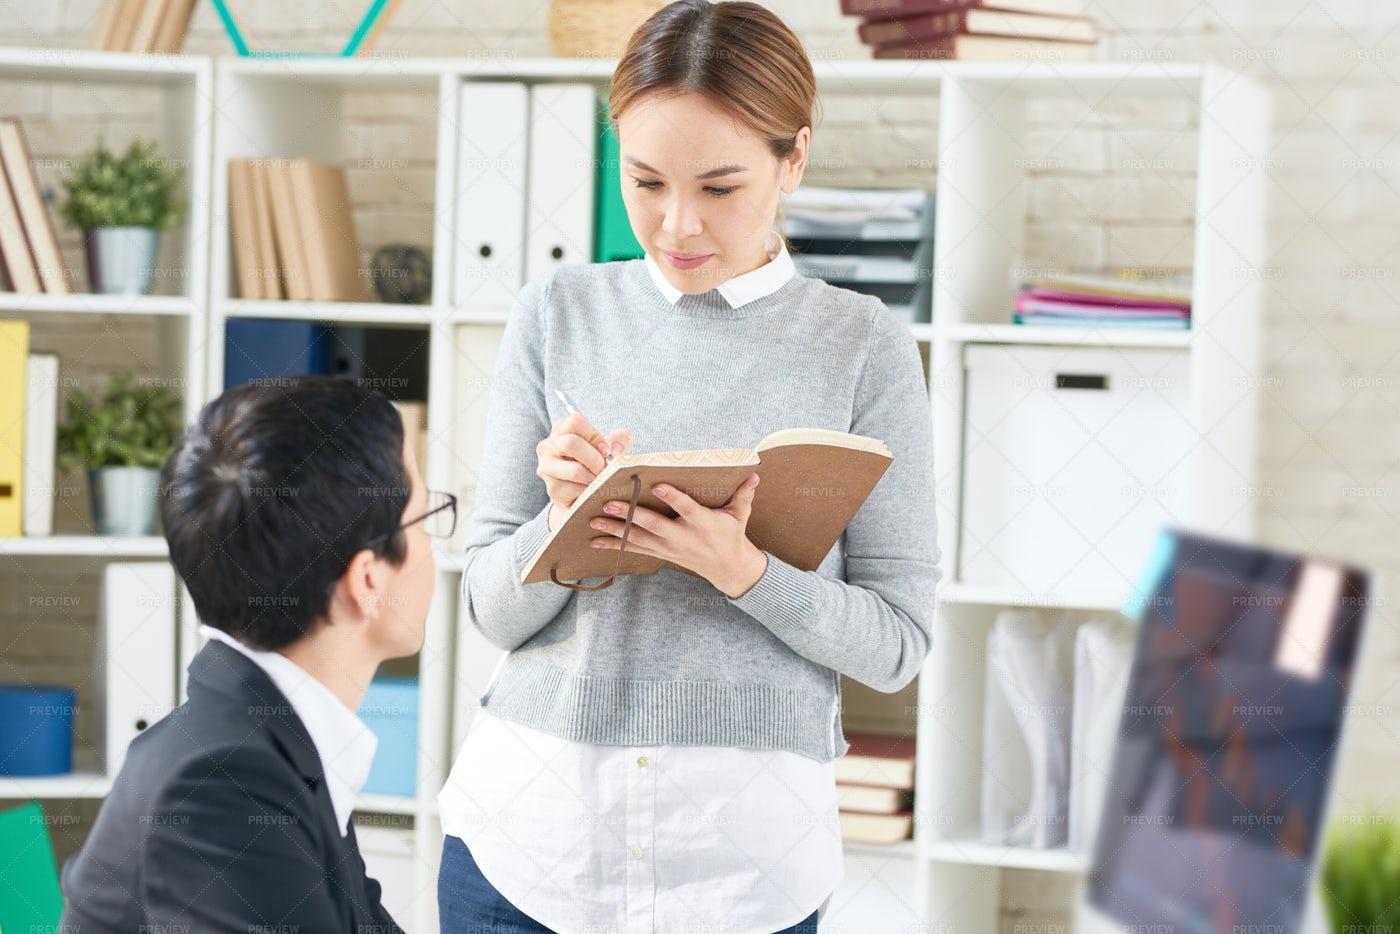 Informal Working Meeting At Open...: Stock Photos